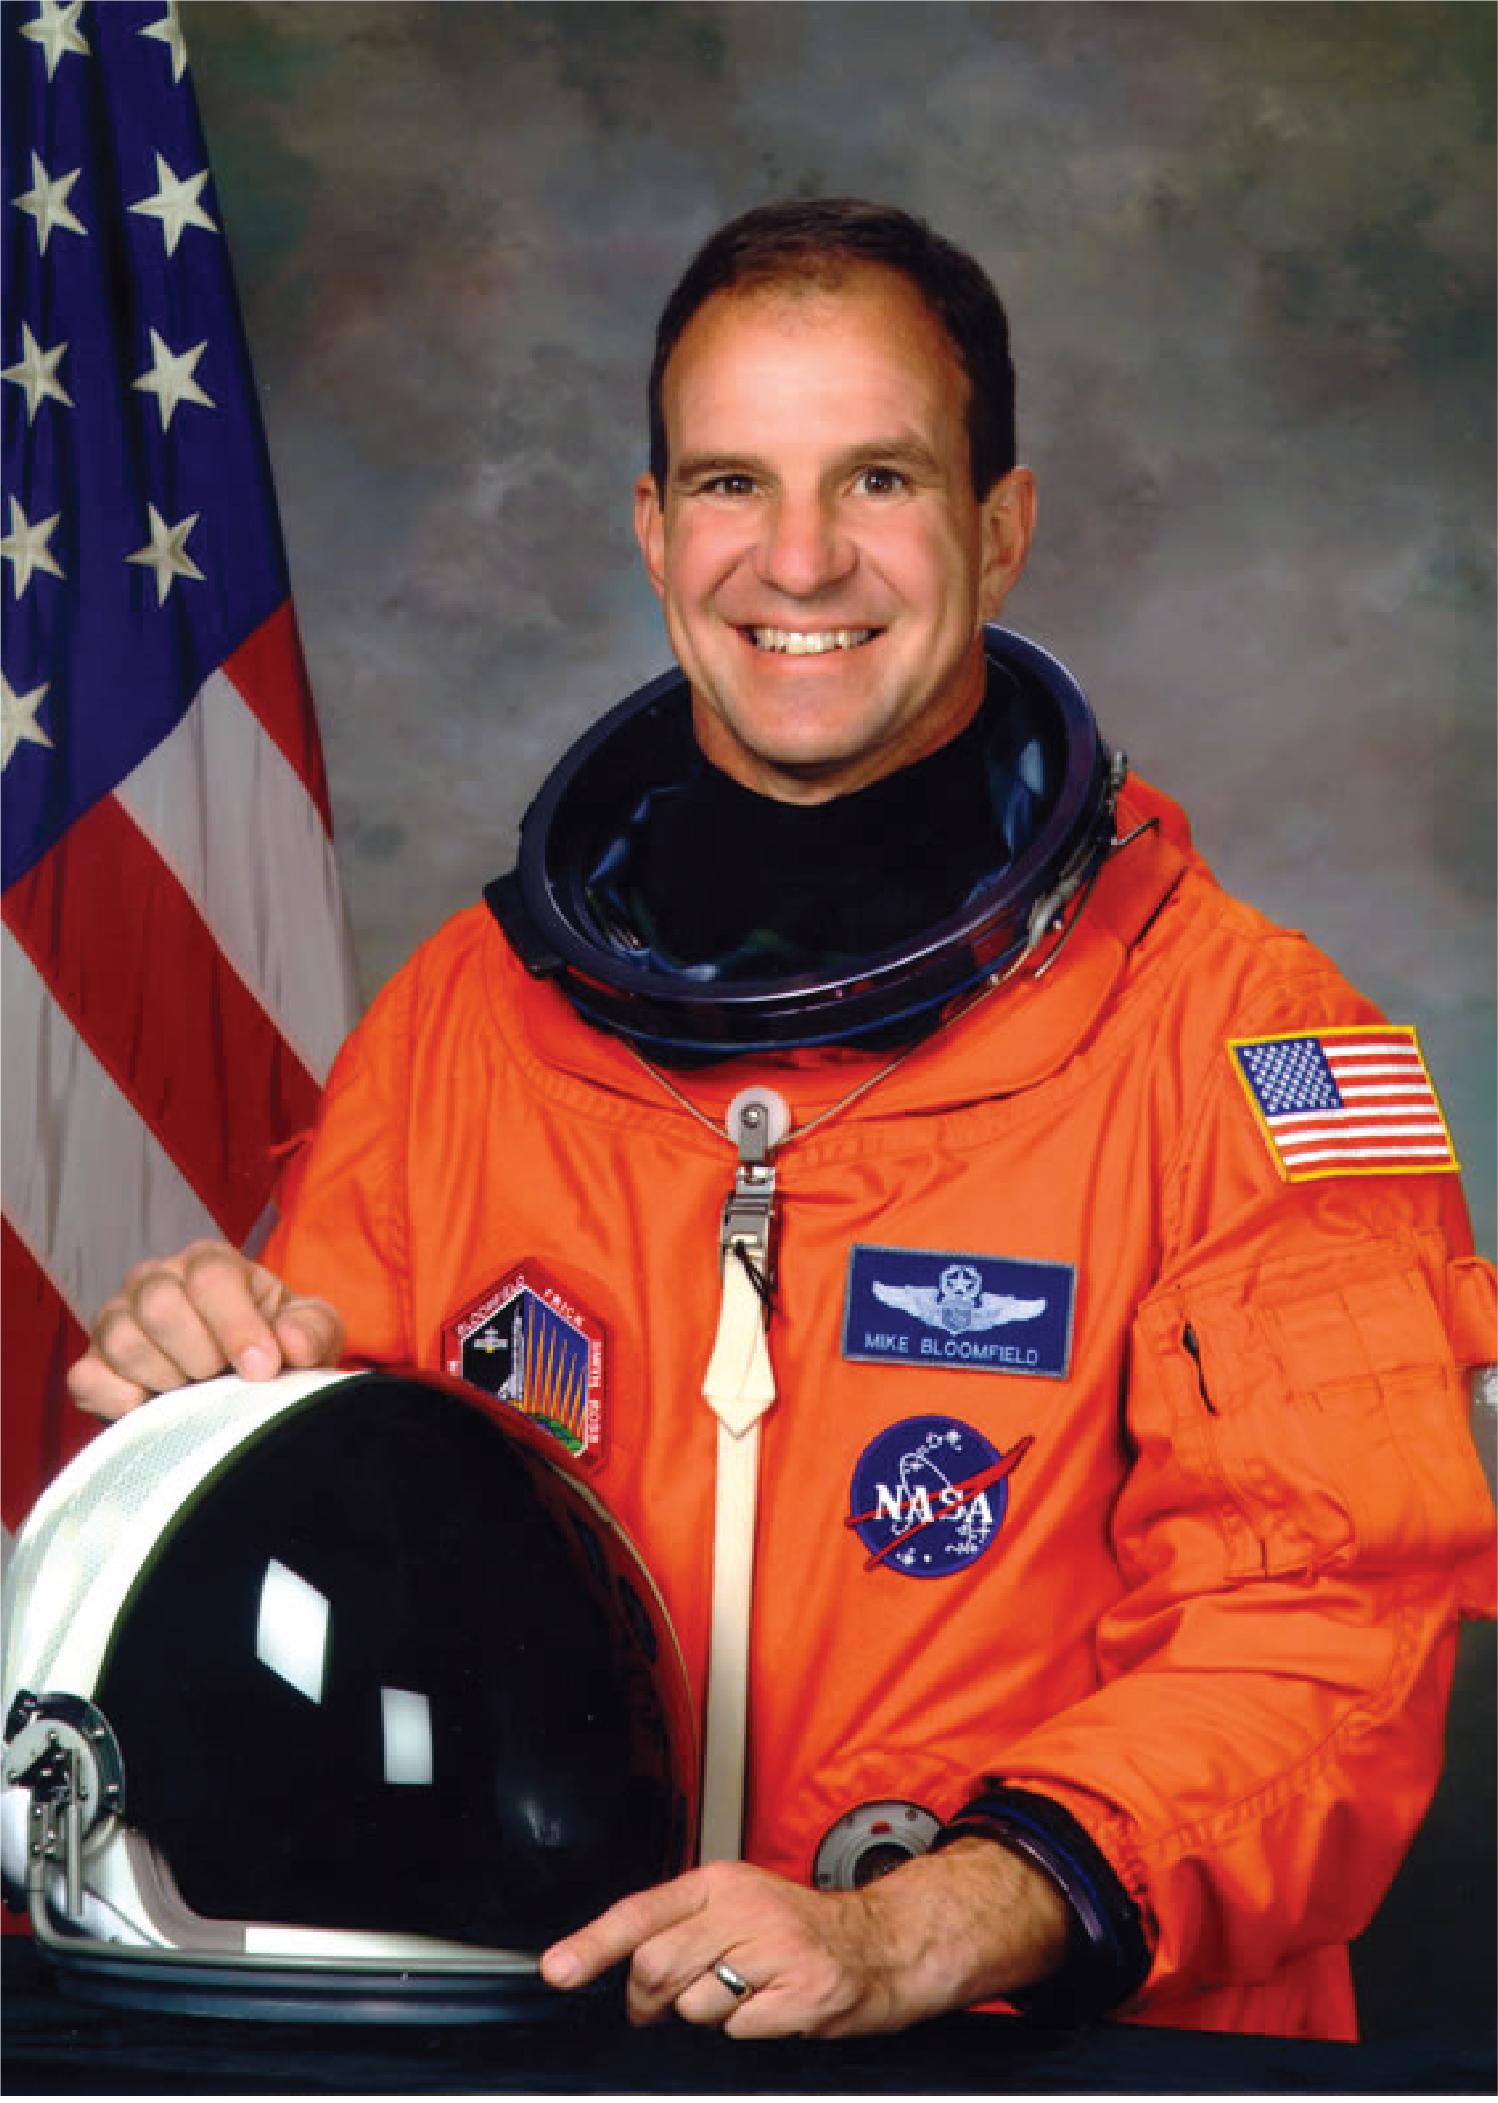 Astronaut Michael J. Bloomfield